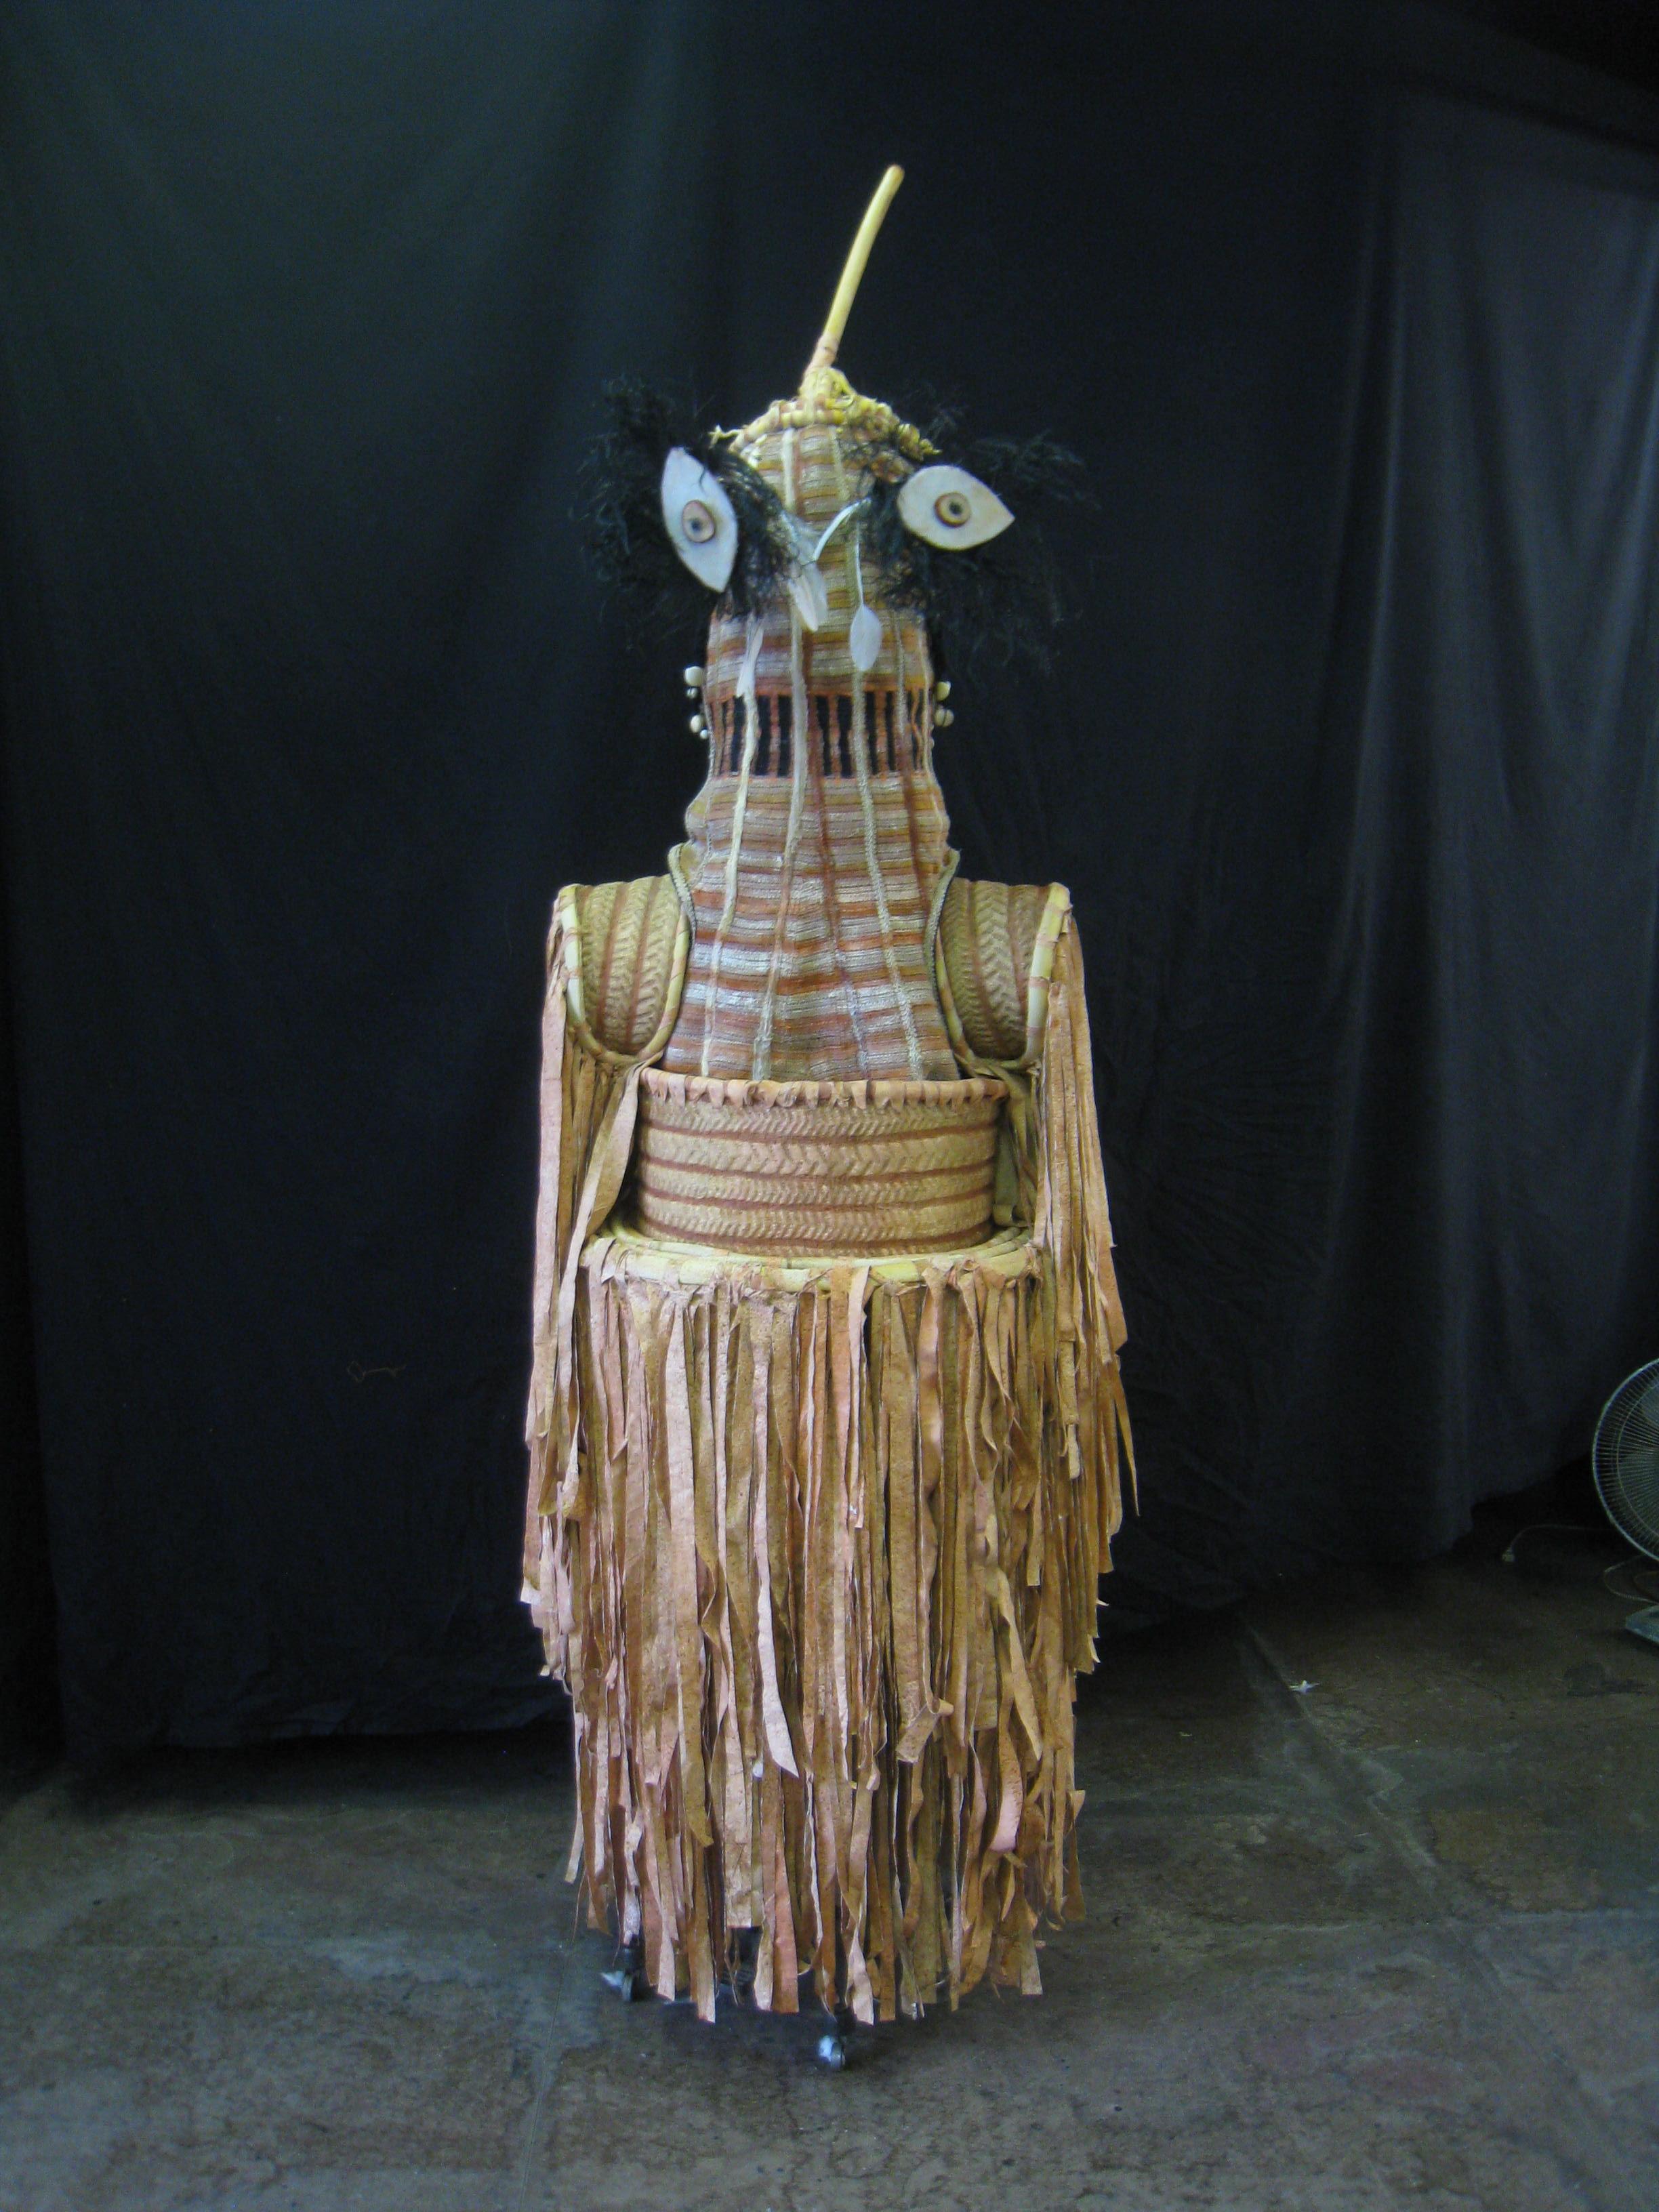 Oceana Costume: Rock the Met, Radio City NY Spectacular